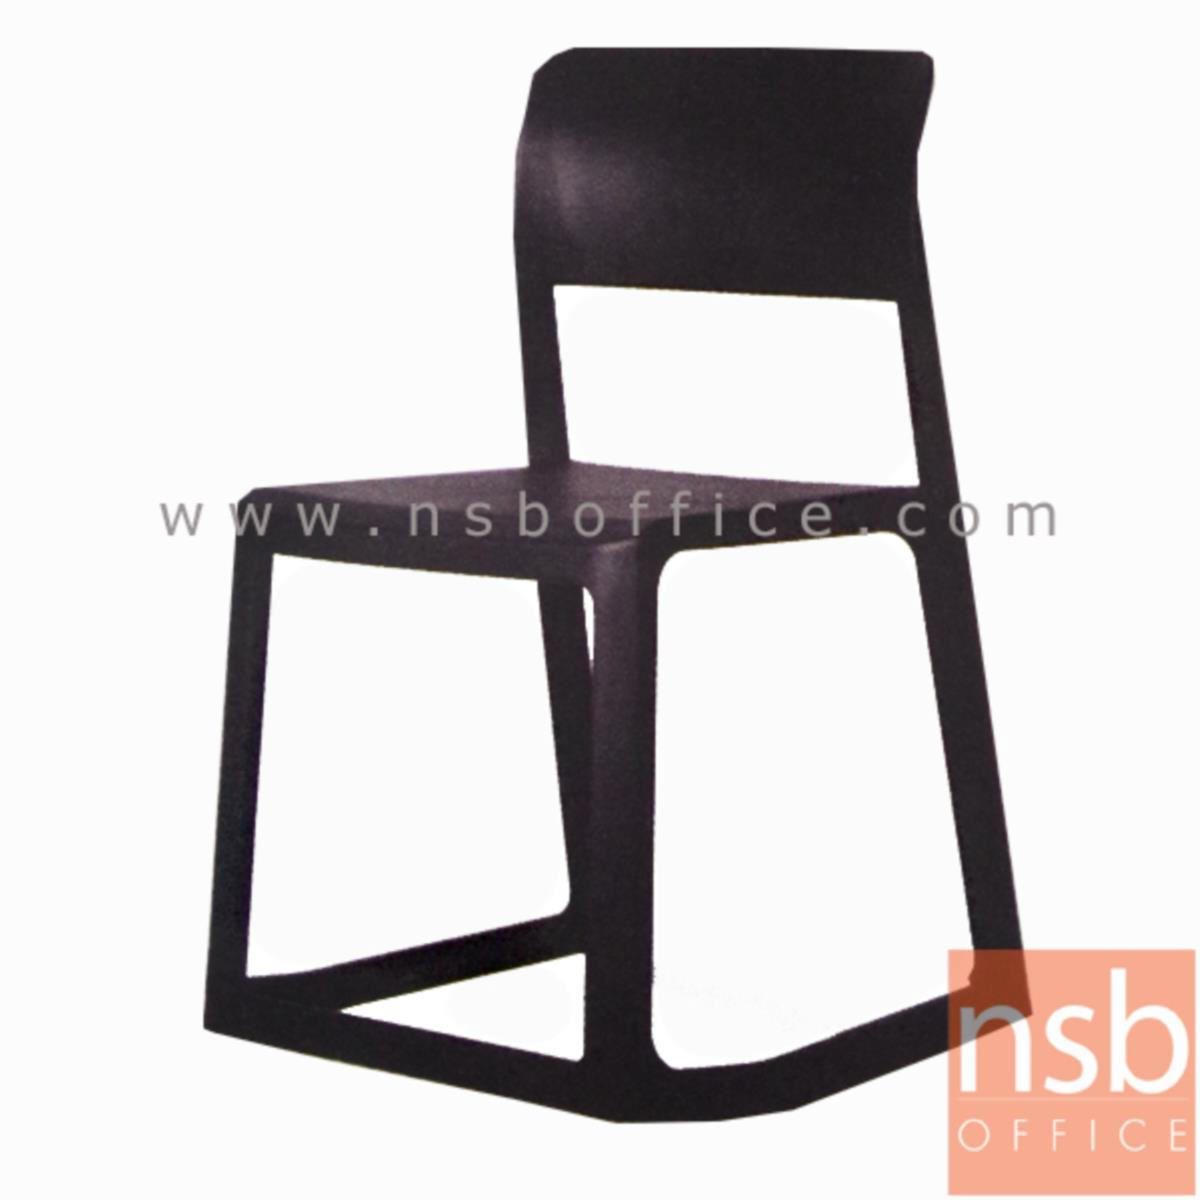 B29A185:เก้าอี้โมดิร์นพลาสติกโพลี่(PP)ล้วน รุ่น Jaecey (เจซีย์) ขนาด 48.5W cm.